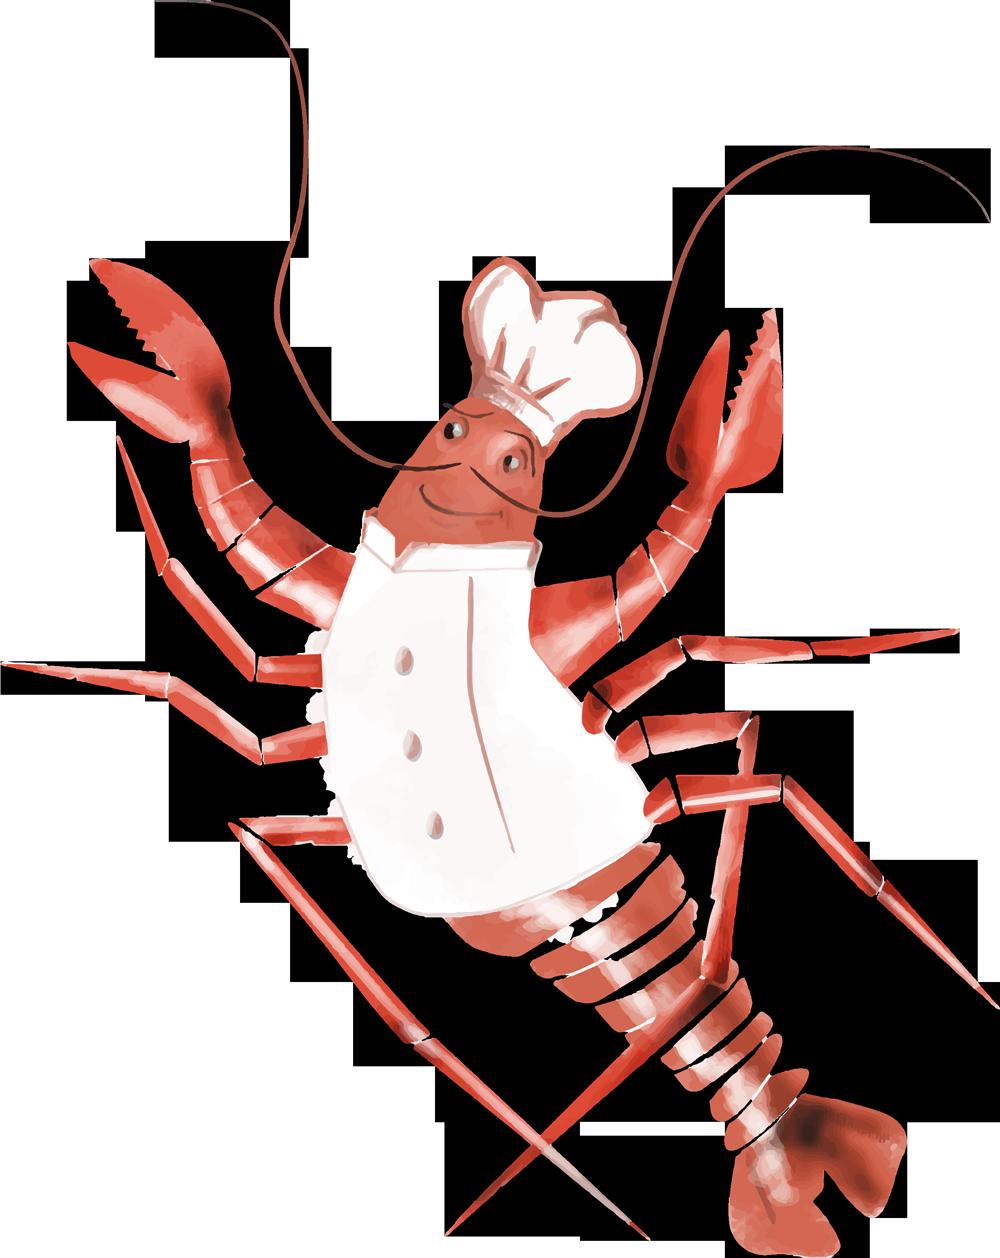 Dancing Lobster